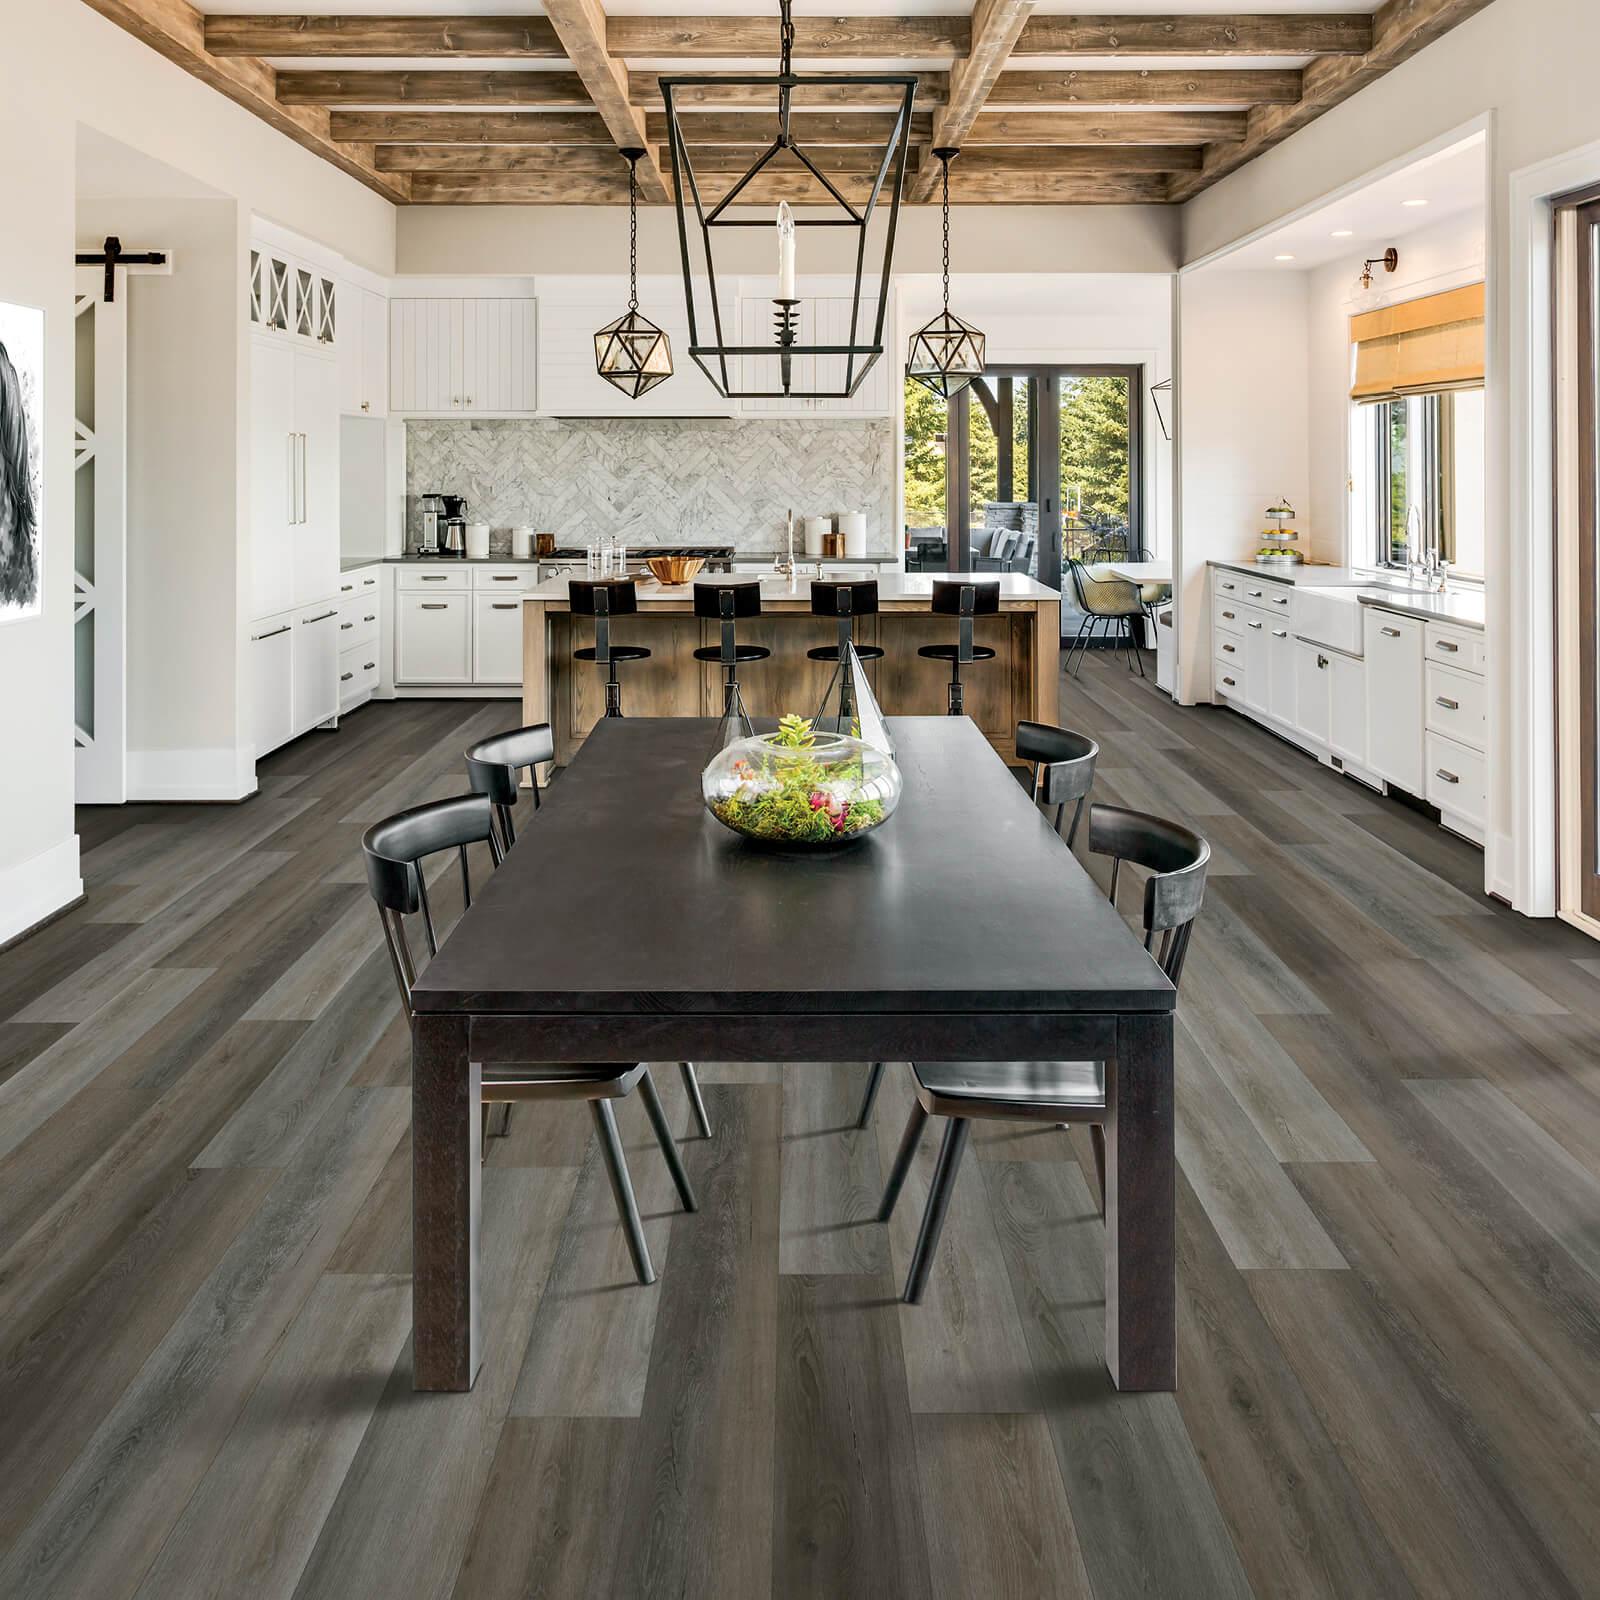 Dining room flooring | Dolphin Carpet & Tile